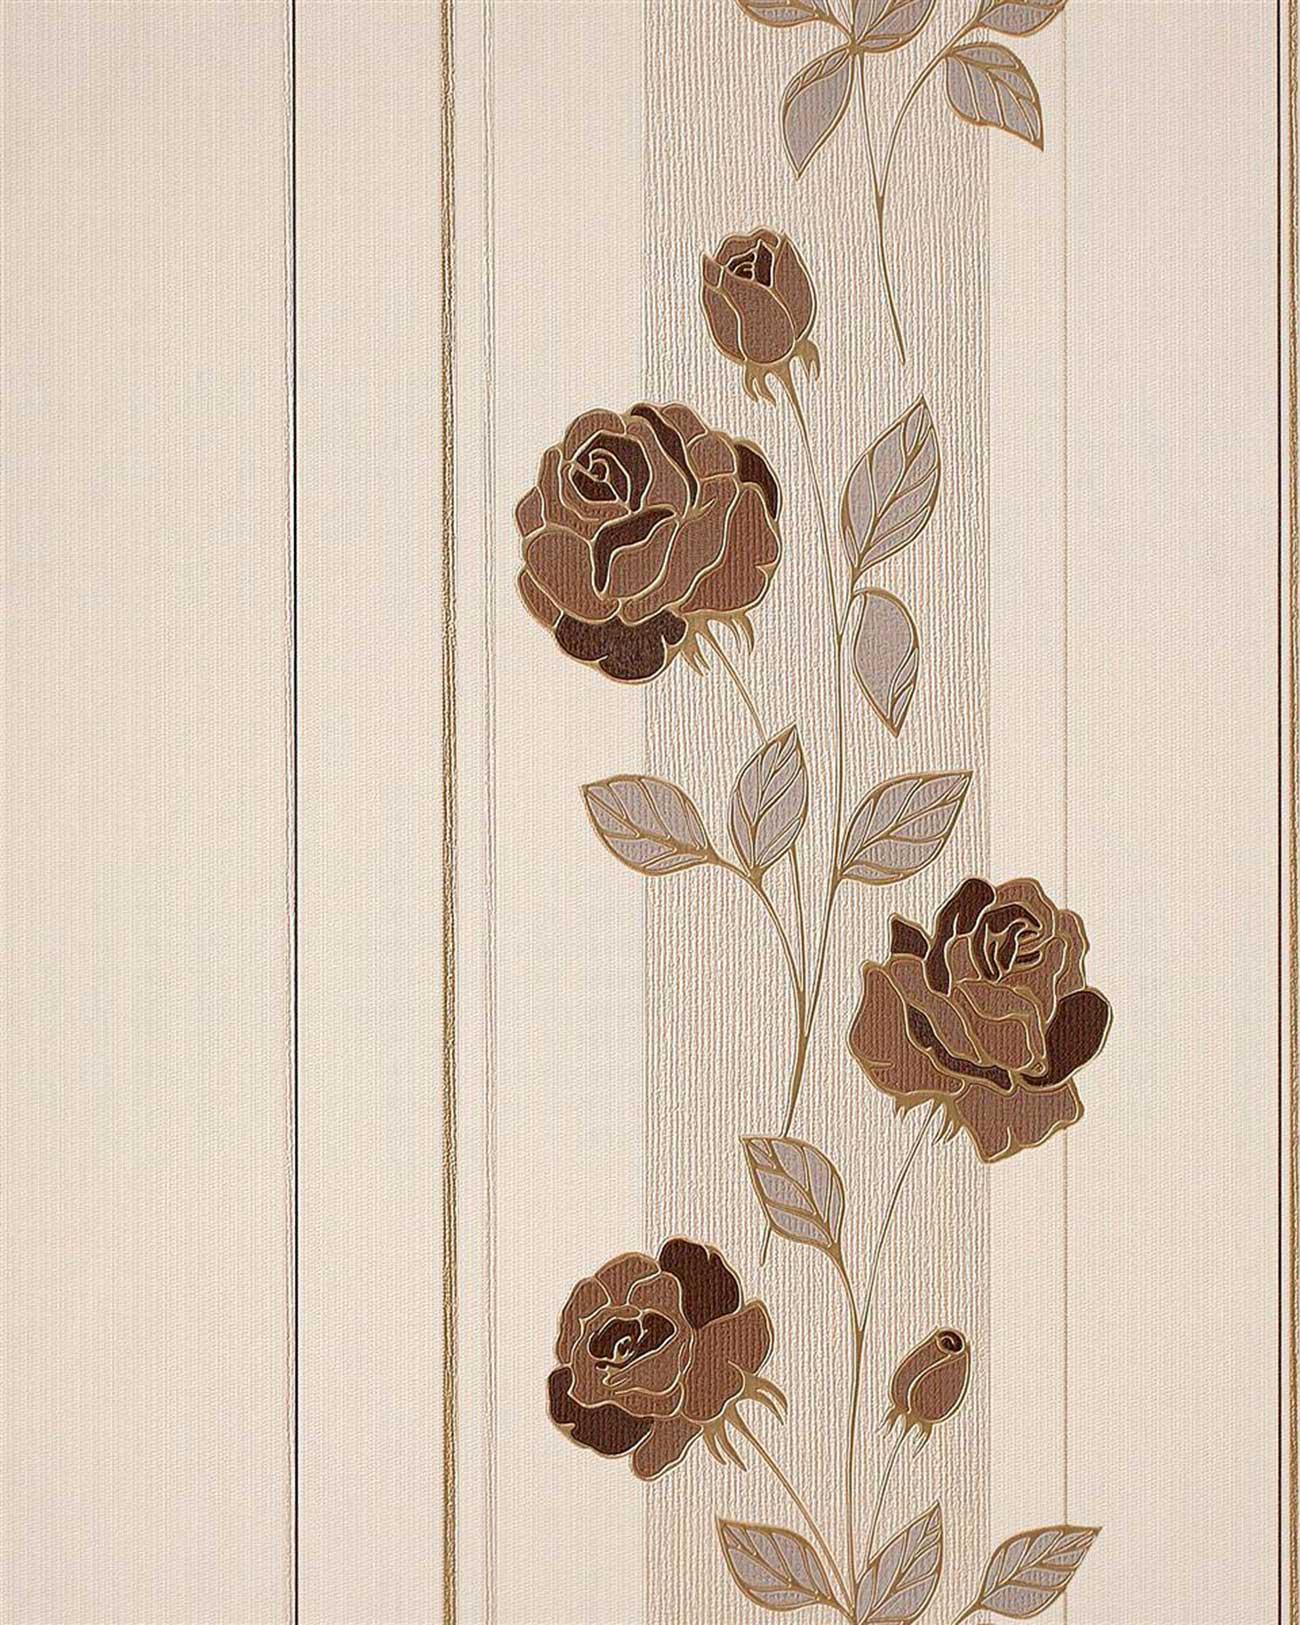 edem 766 36 deluxe floral blumen streifen tapete original. Black Bedroom Furniture Sets. Home Design Ideas